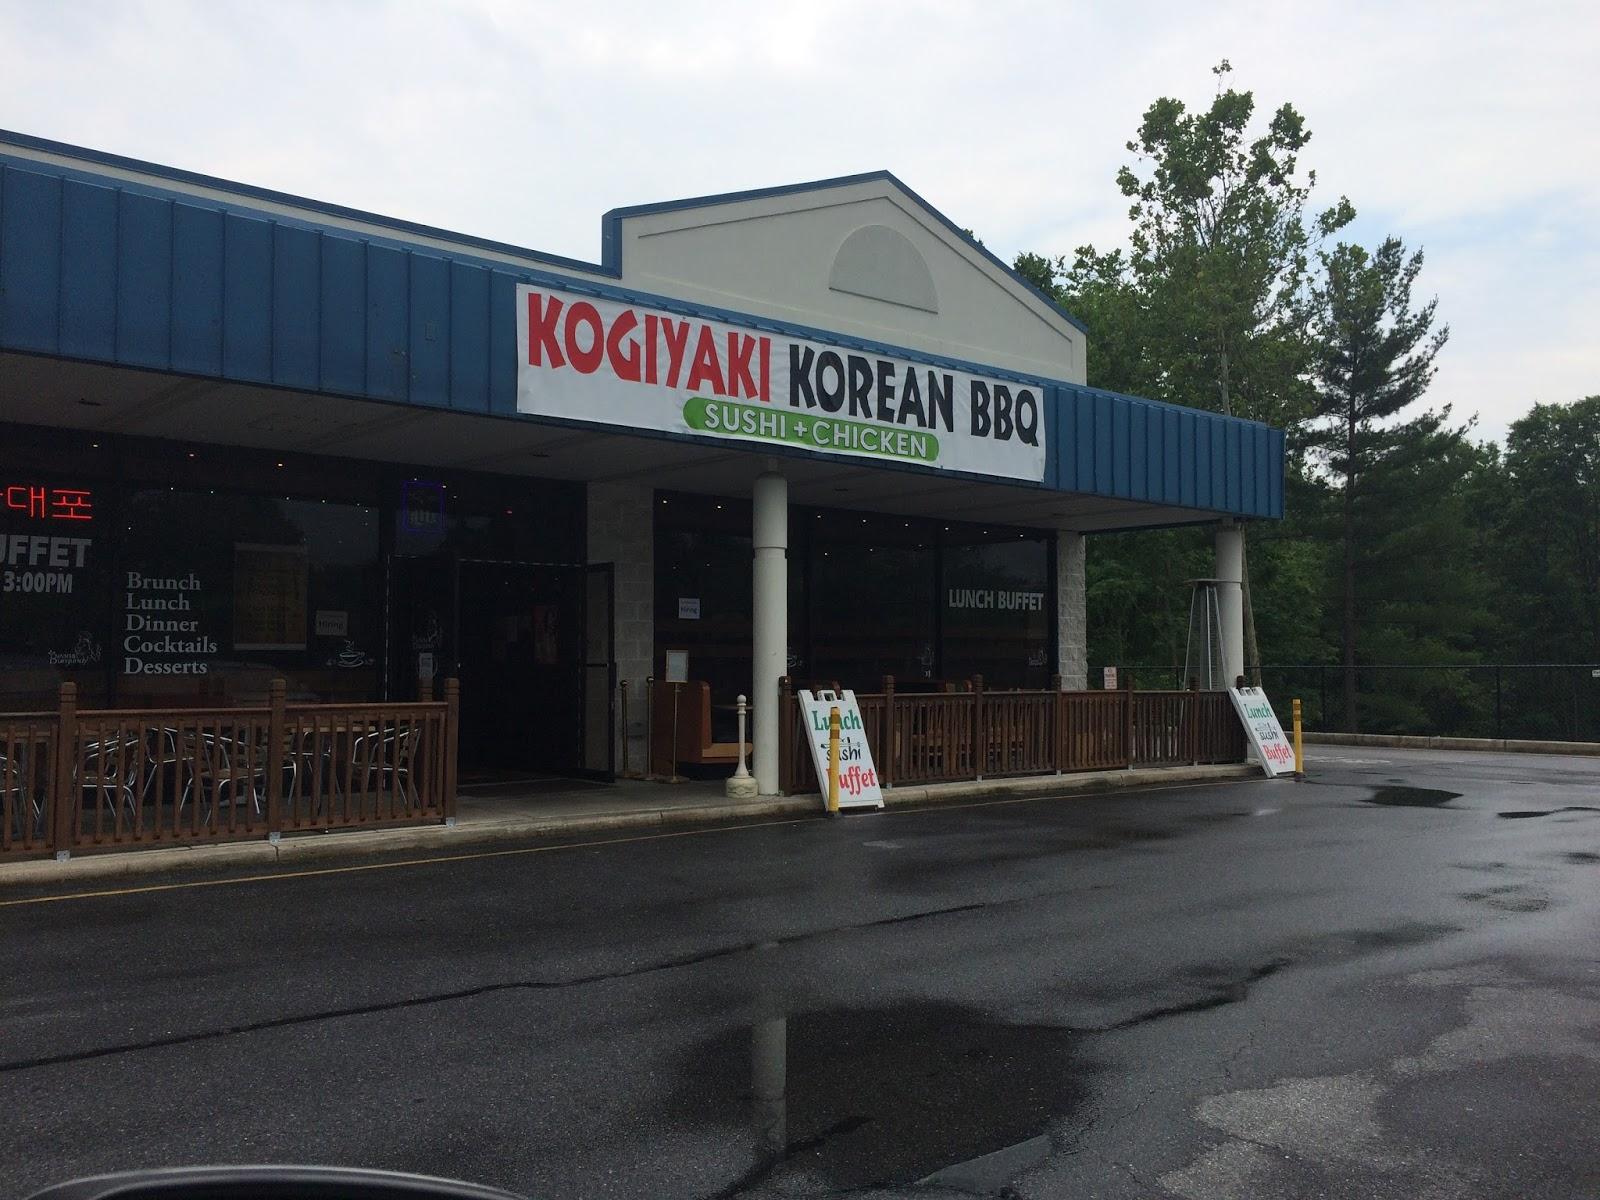 Korean Restaurant In Ellicott City Maryland